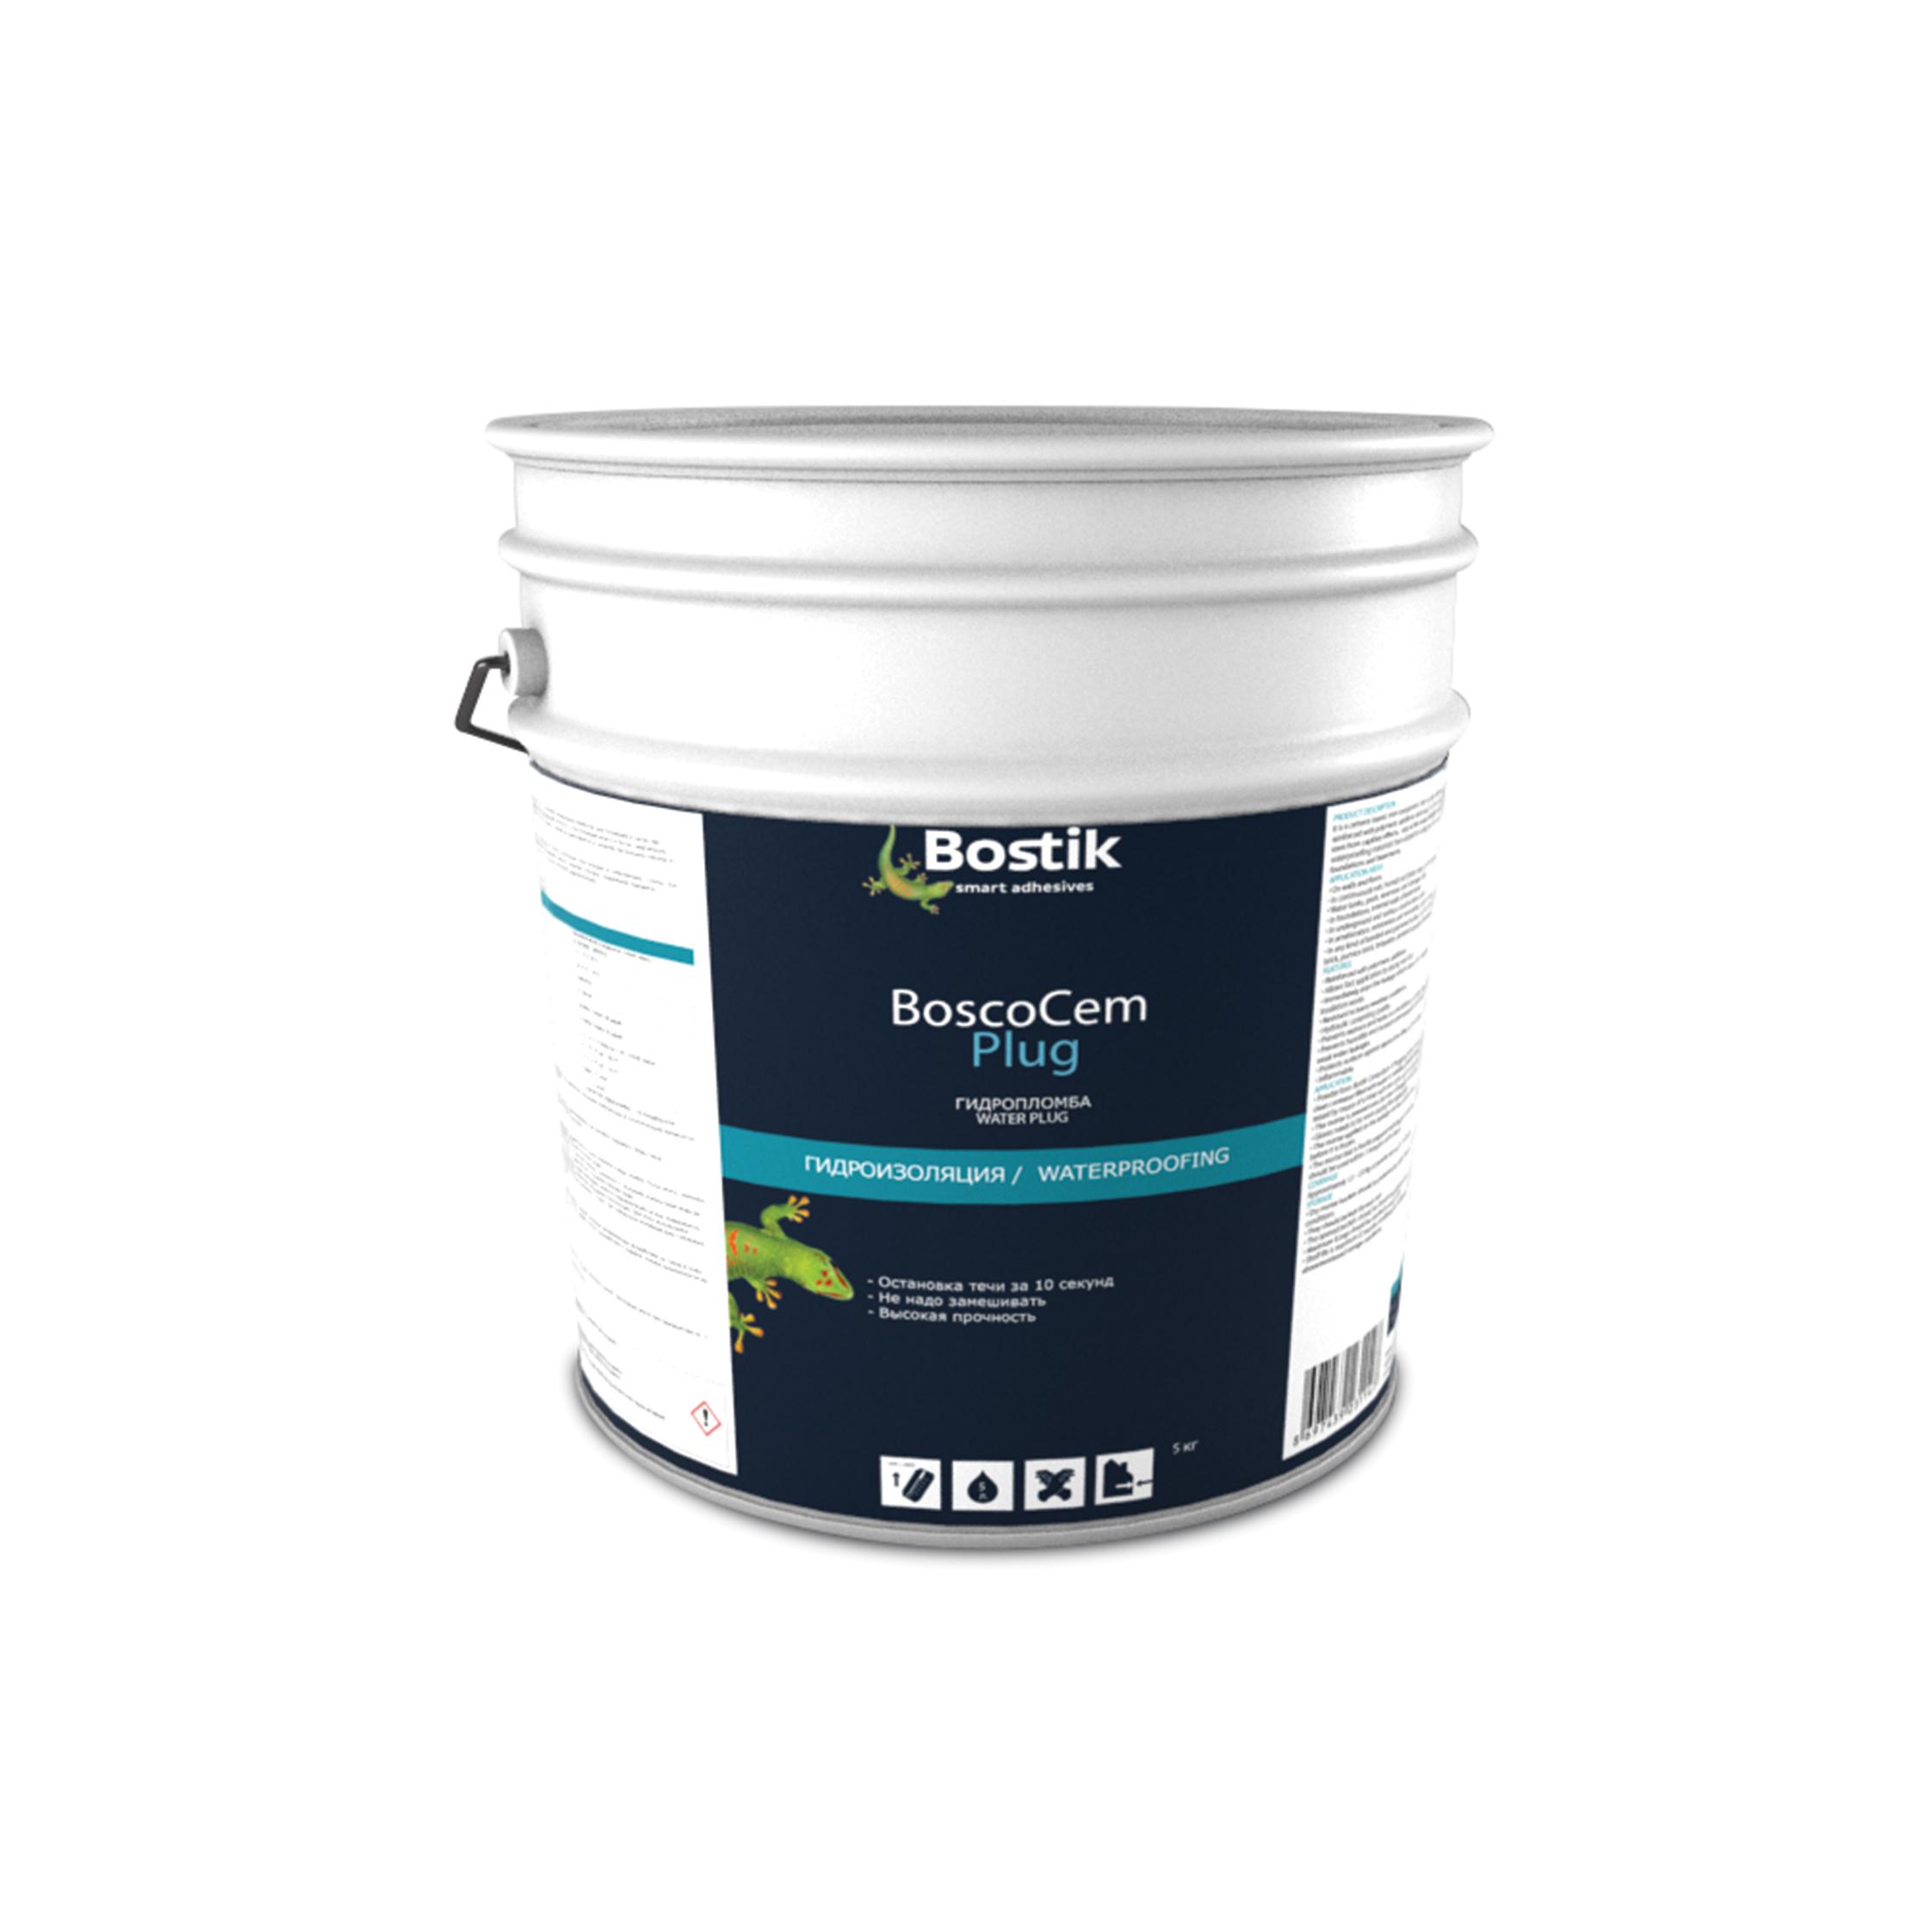 Гидропломба Бостик, 1 кг